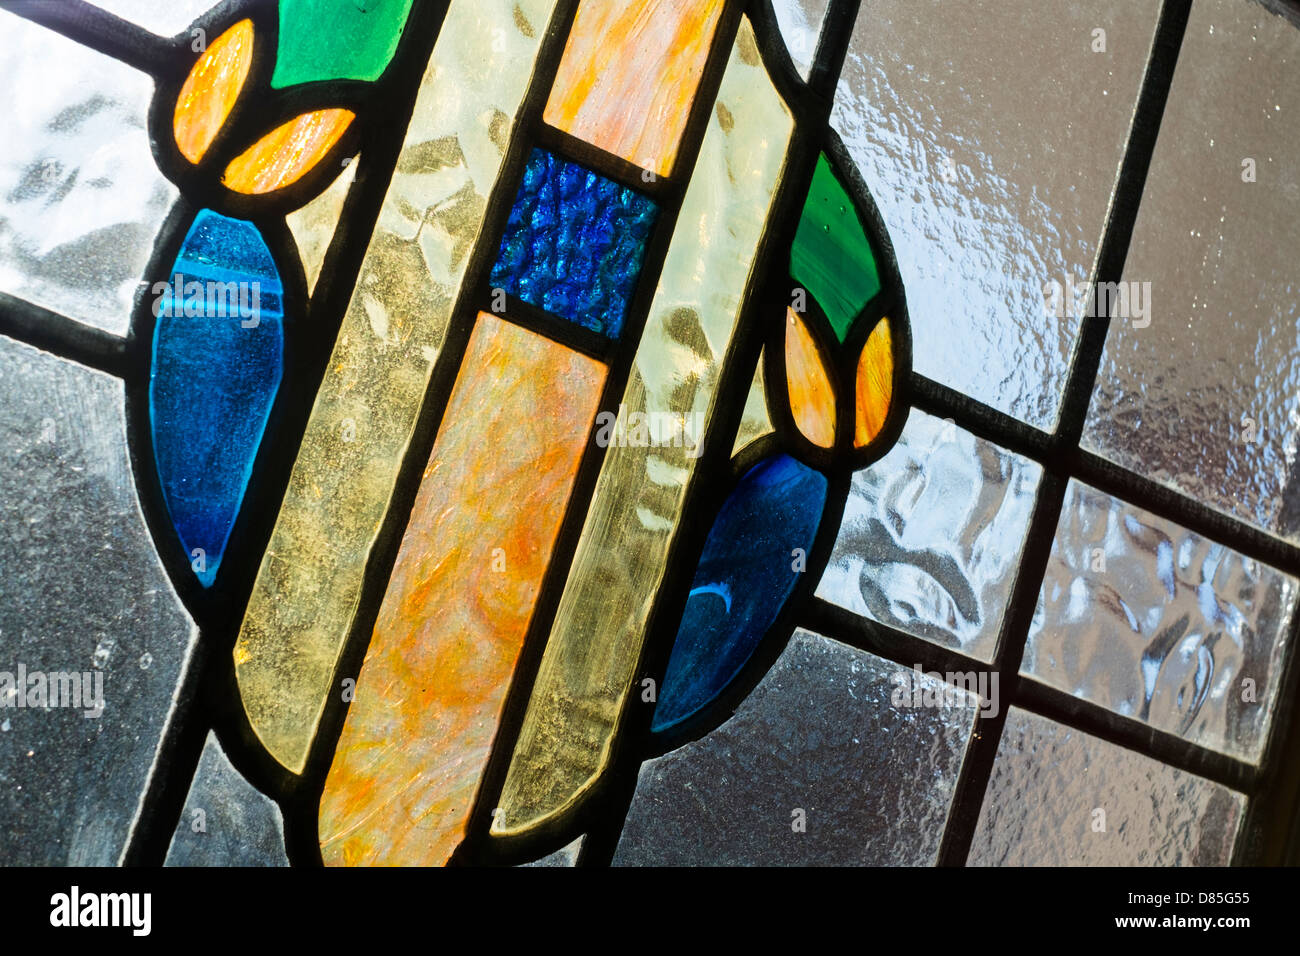 Original stain glass windows - Stock Image